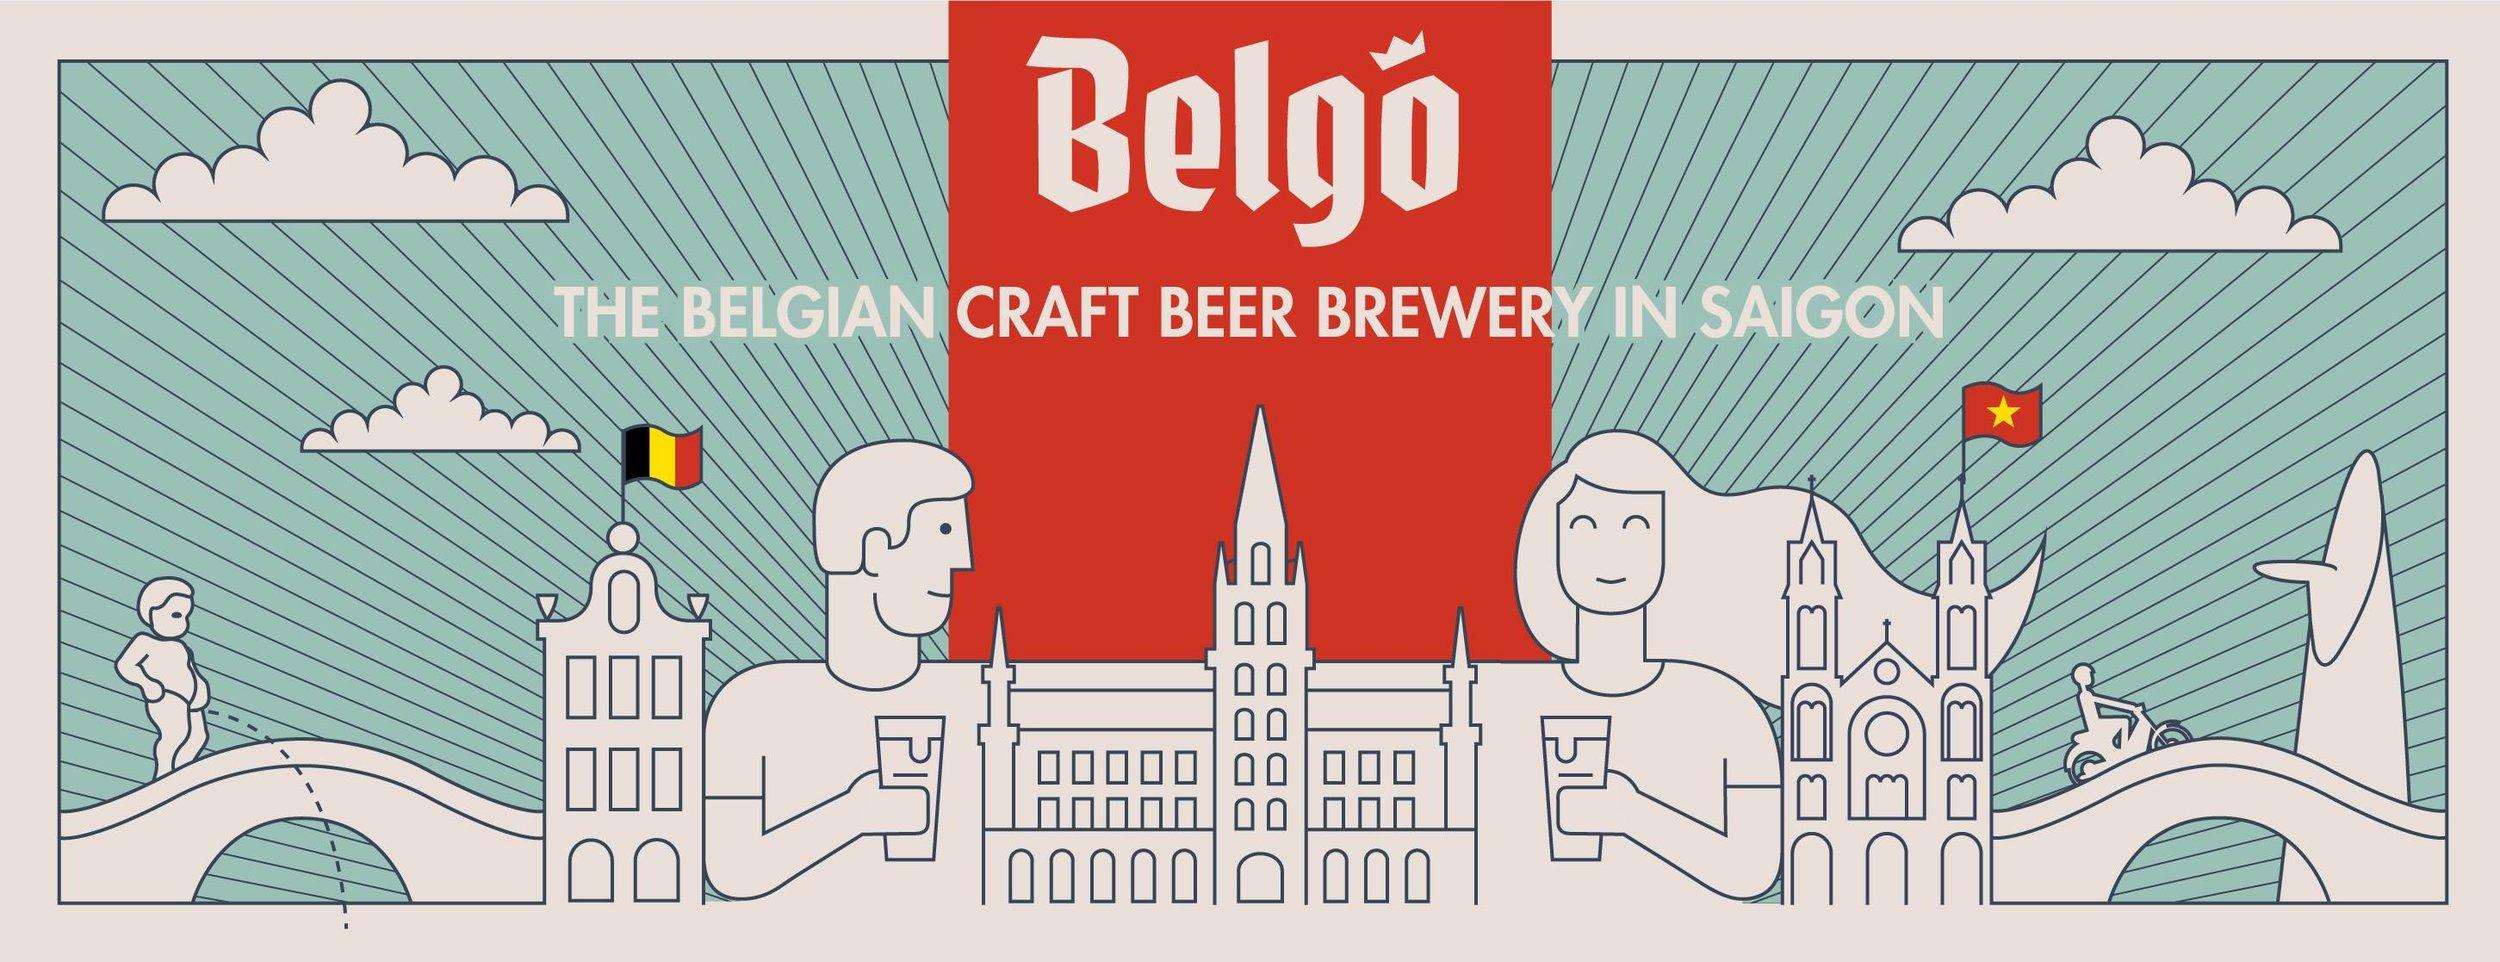 Belgo - Belgian Craft Beer Brewery - Full Consultancy, Staff & Management Training